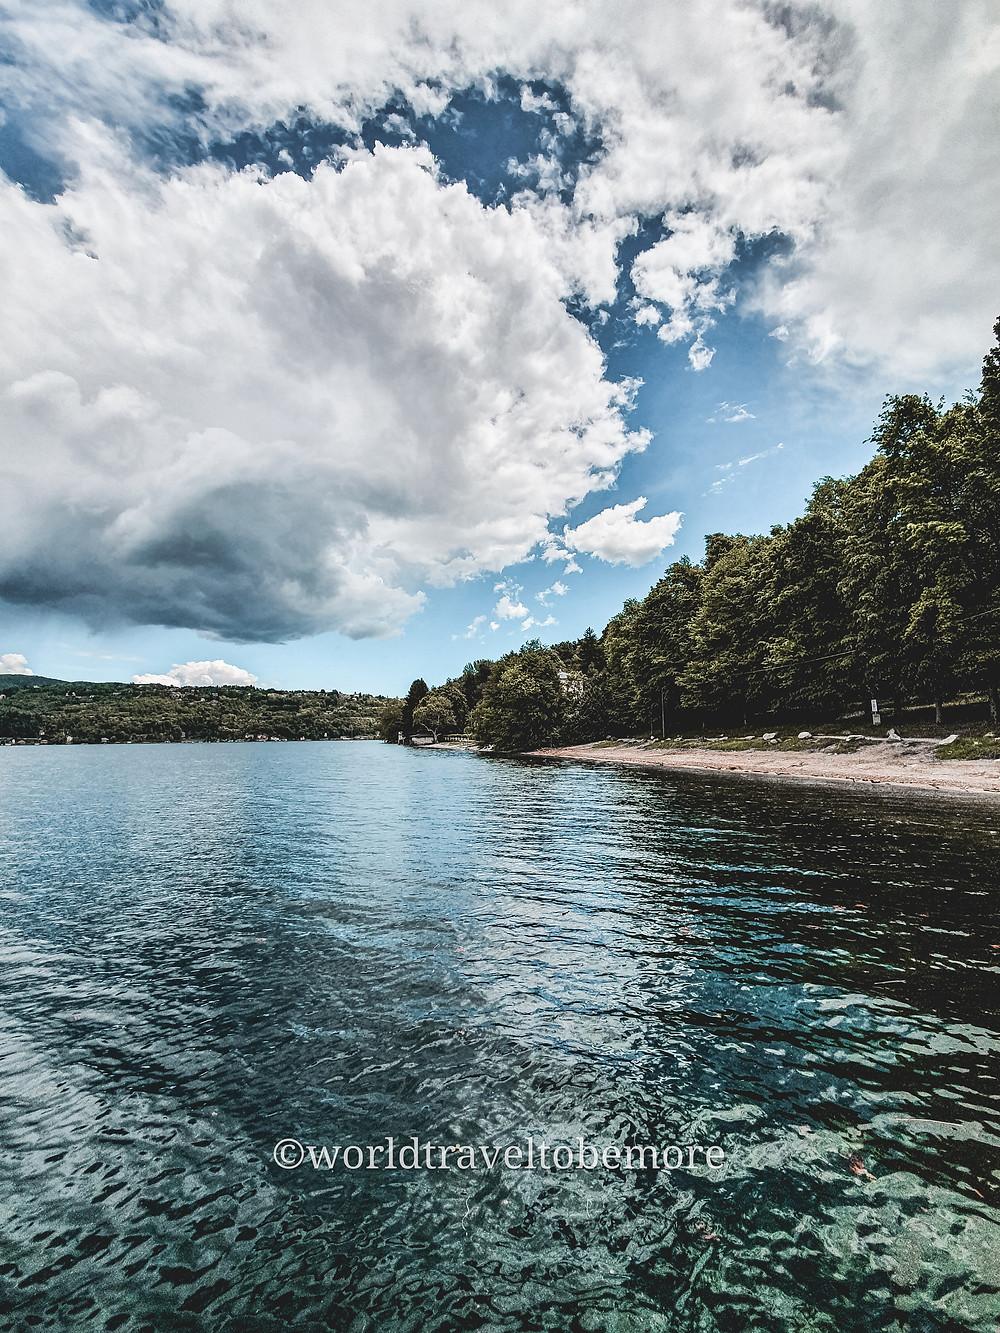 L'incantevole Lago d'Orta, su cui si affaccia Villa Crespi